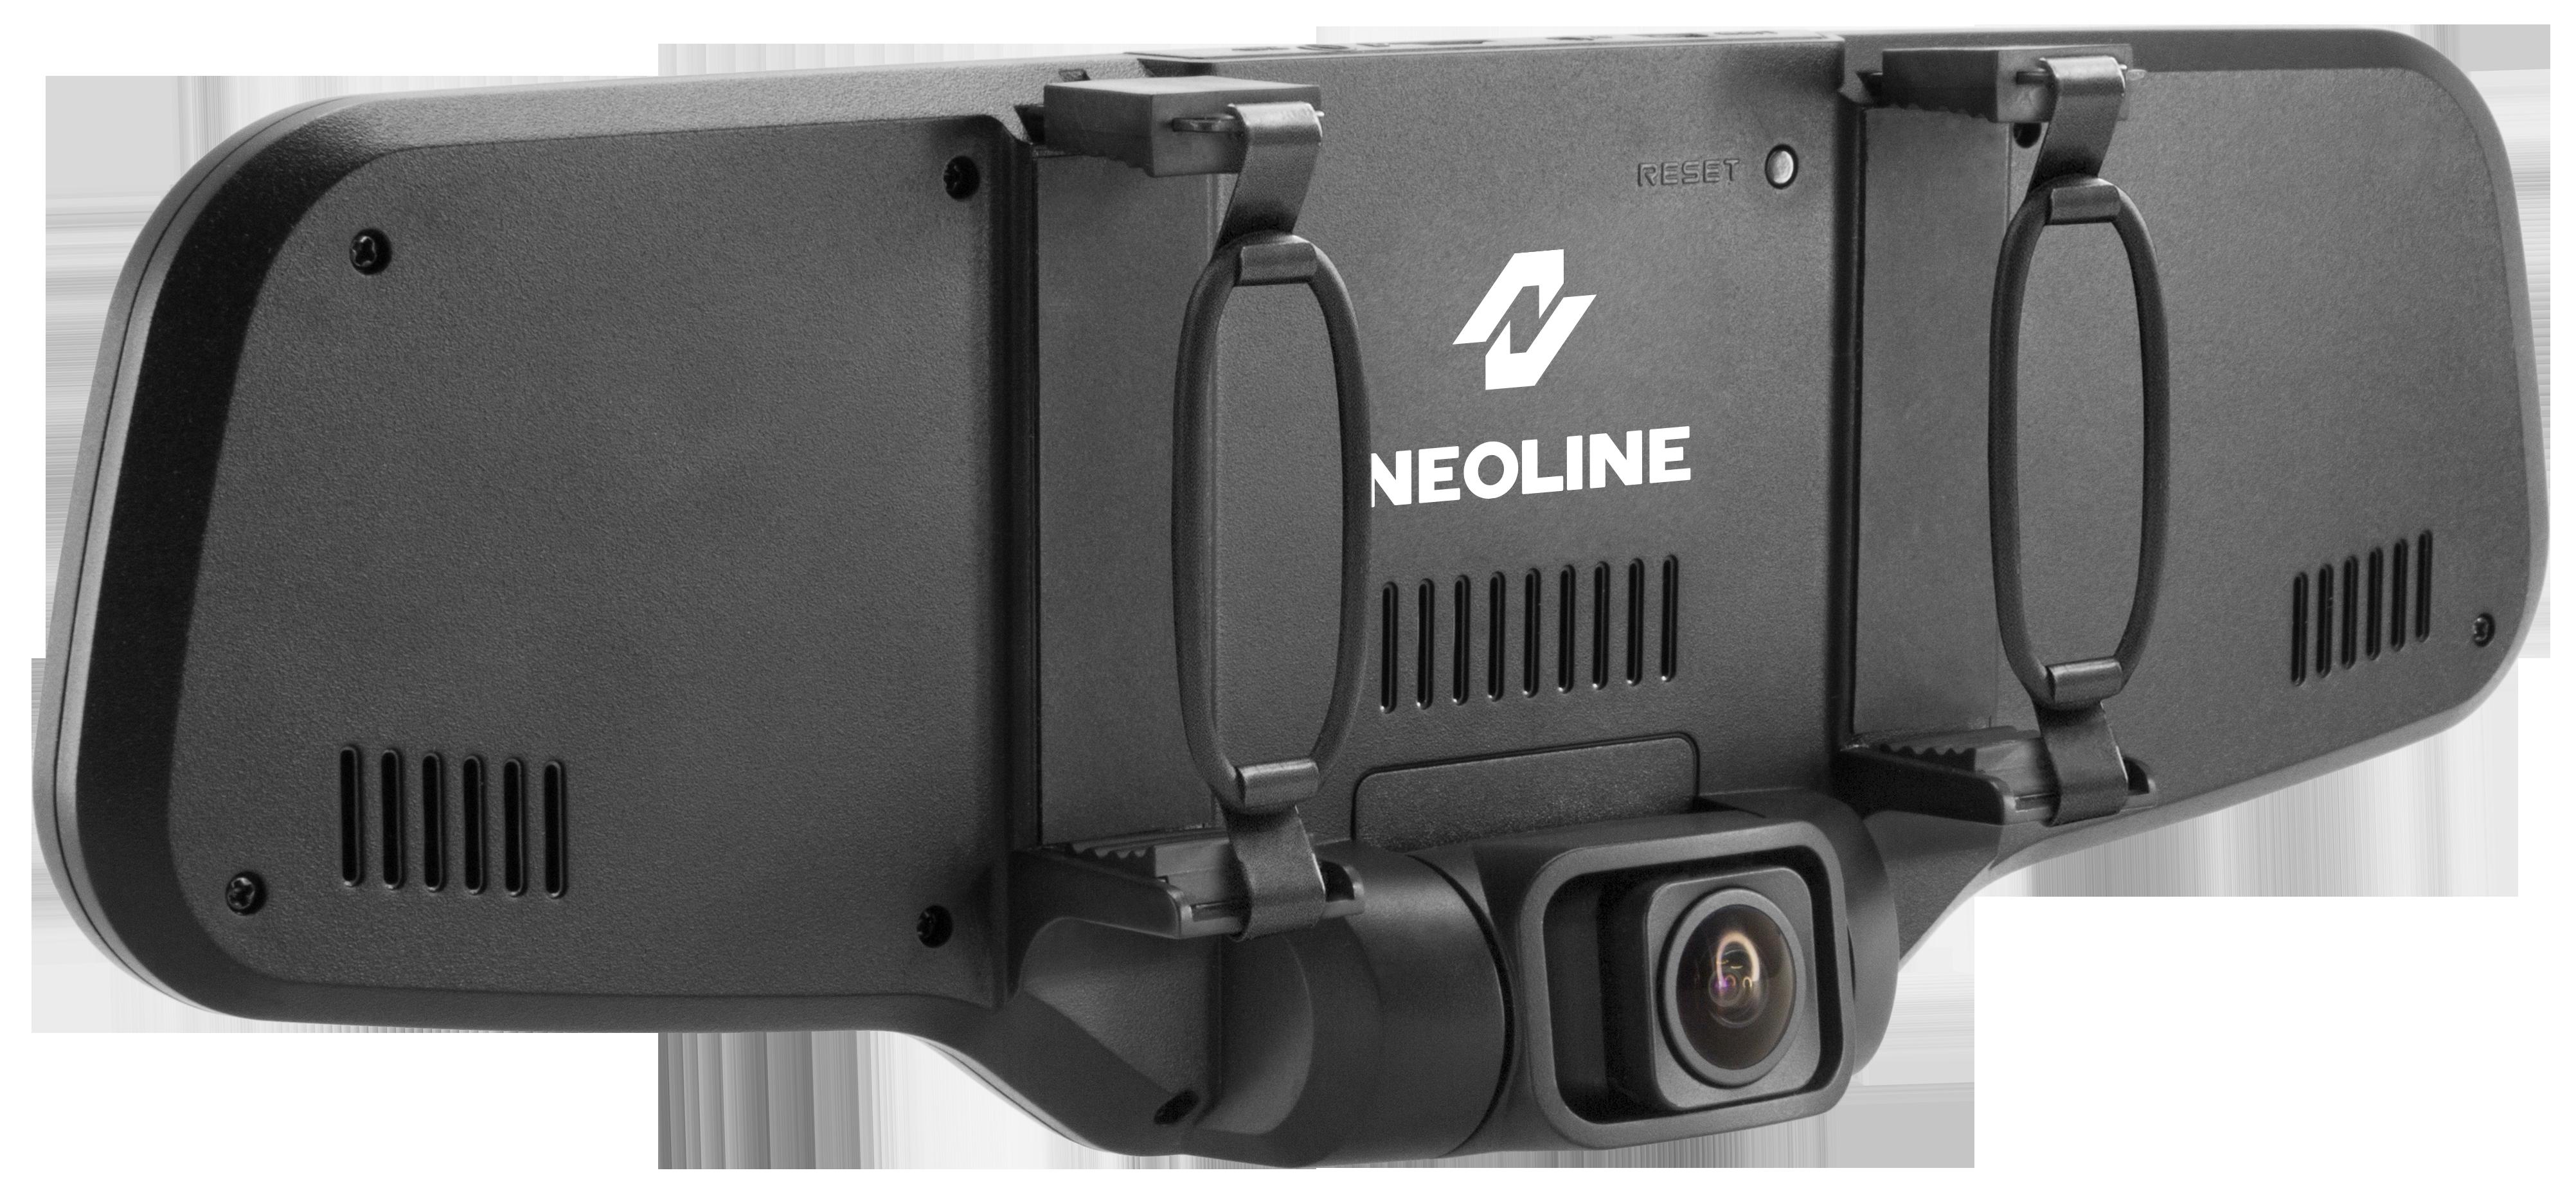 Зеркало заднего вида Neoline G-tech X13 с видеорегистратором